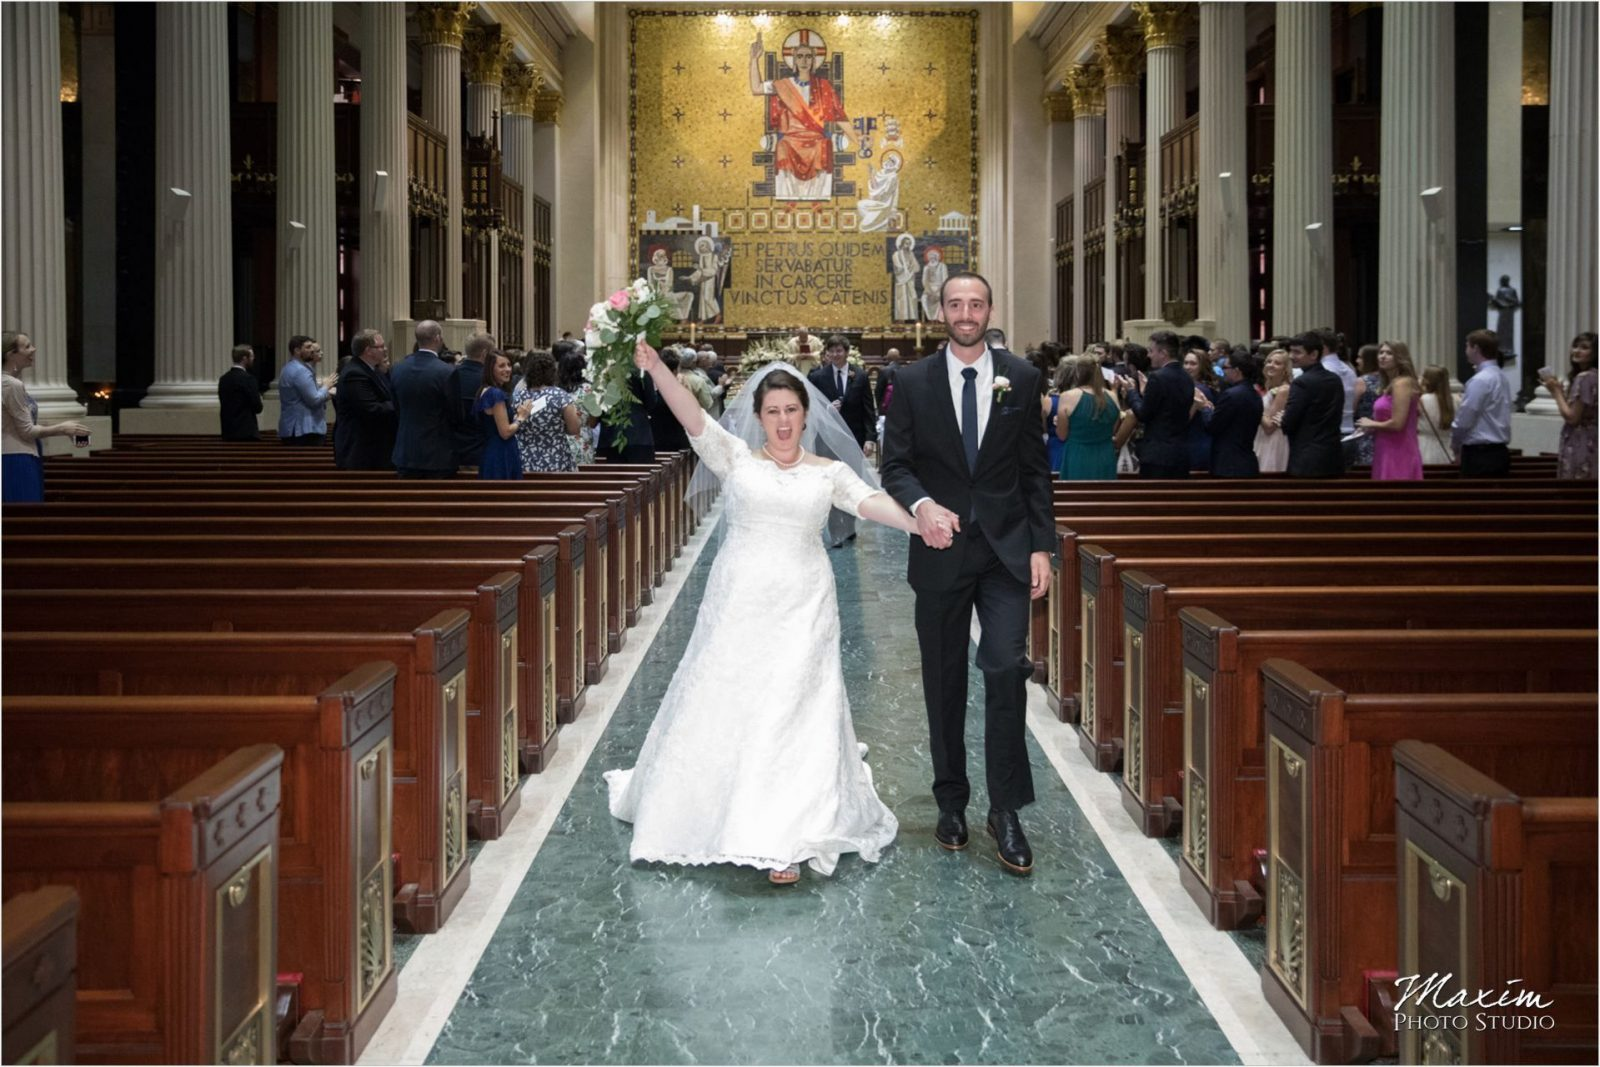 St. Peter in Chains Cincinnati Wedding Ceremony